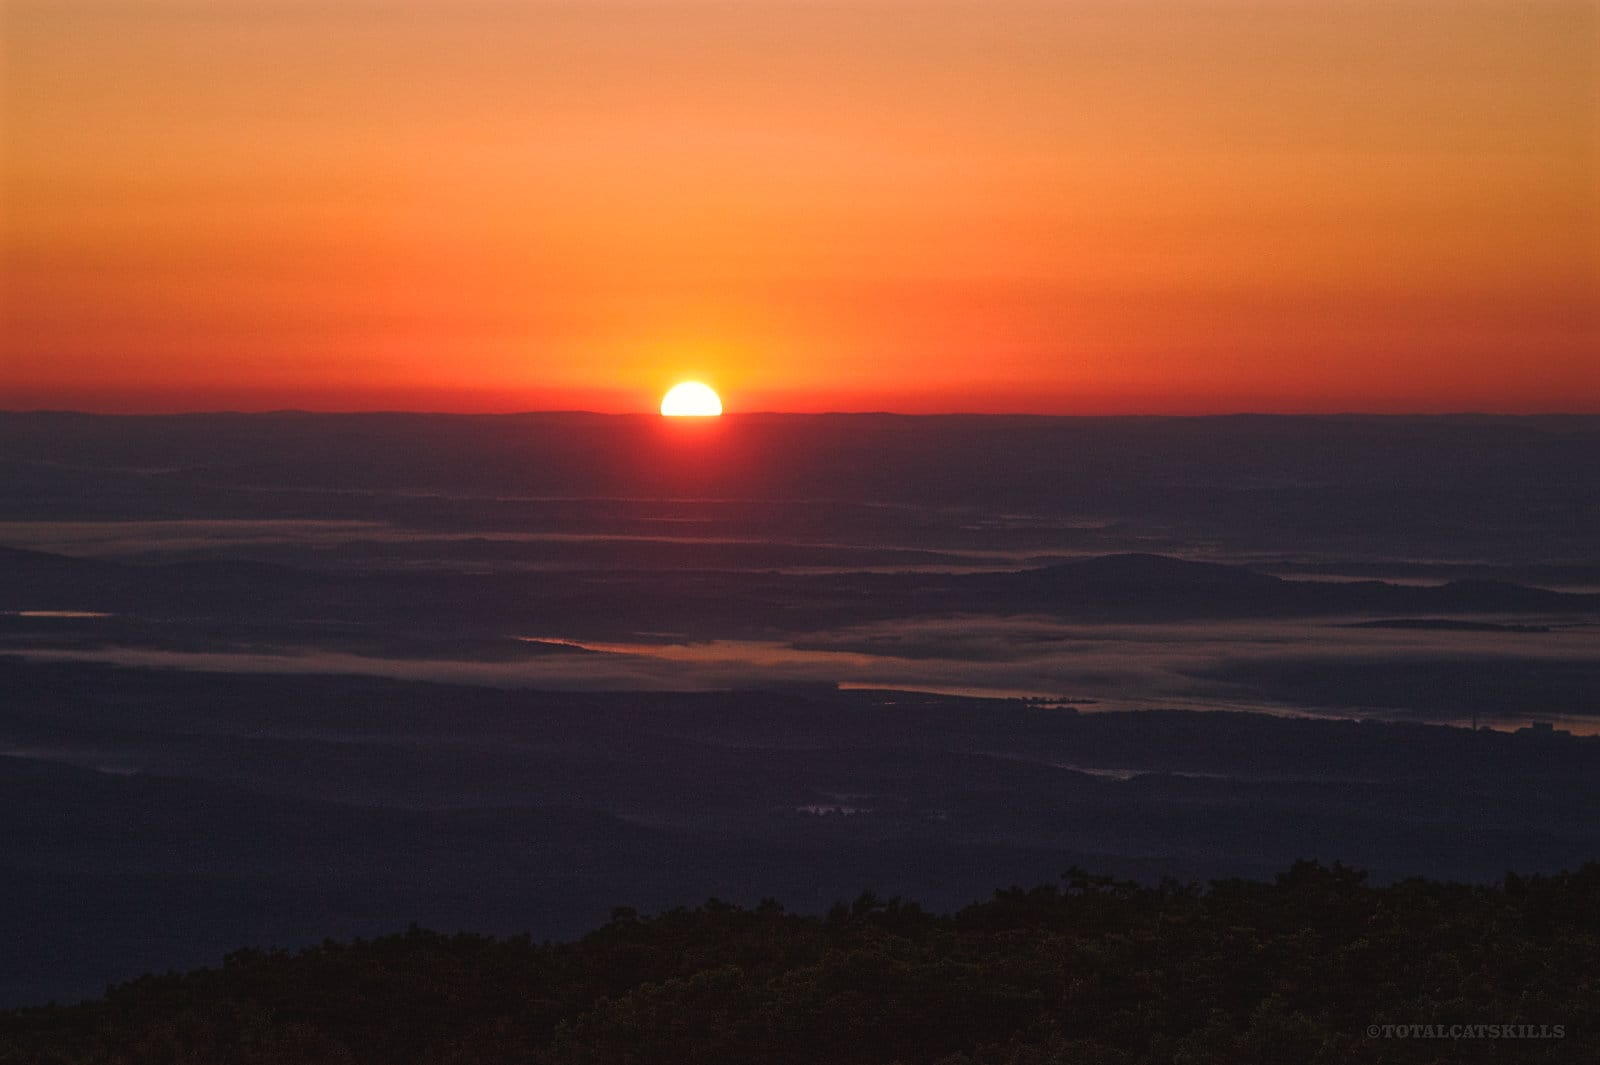 sun rising on the horizon